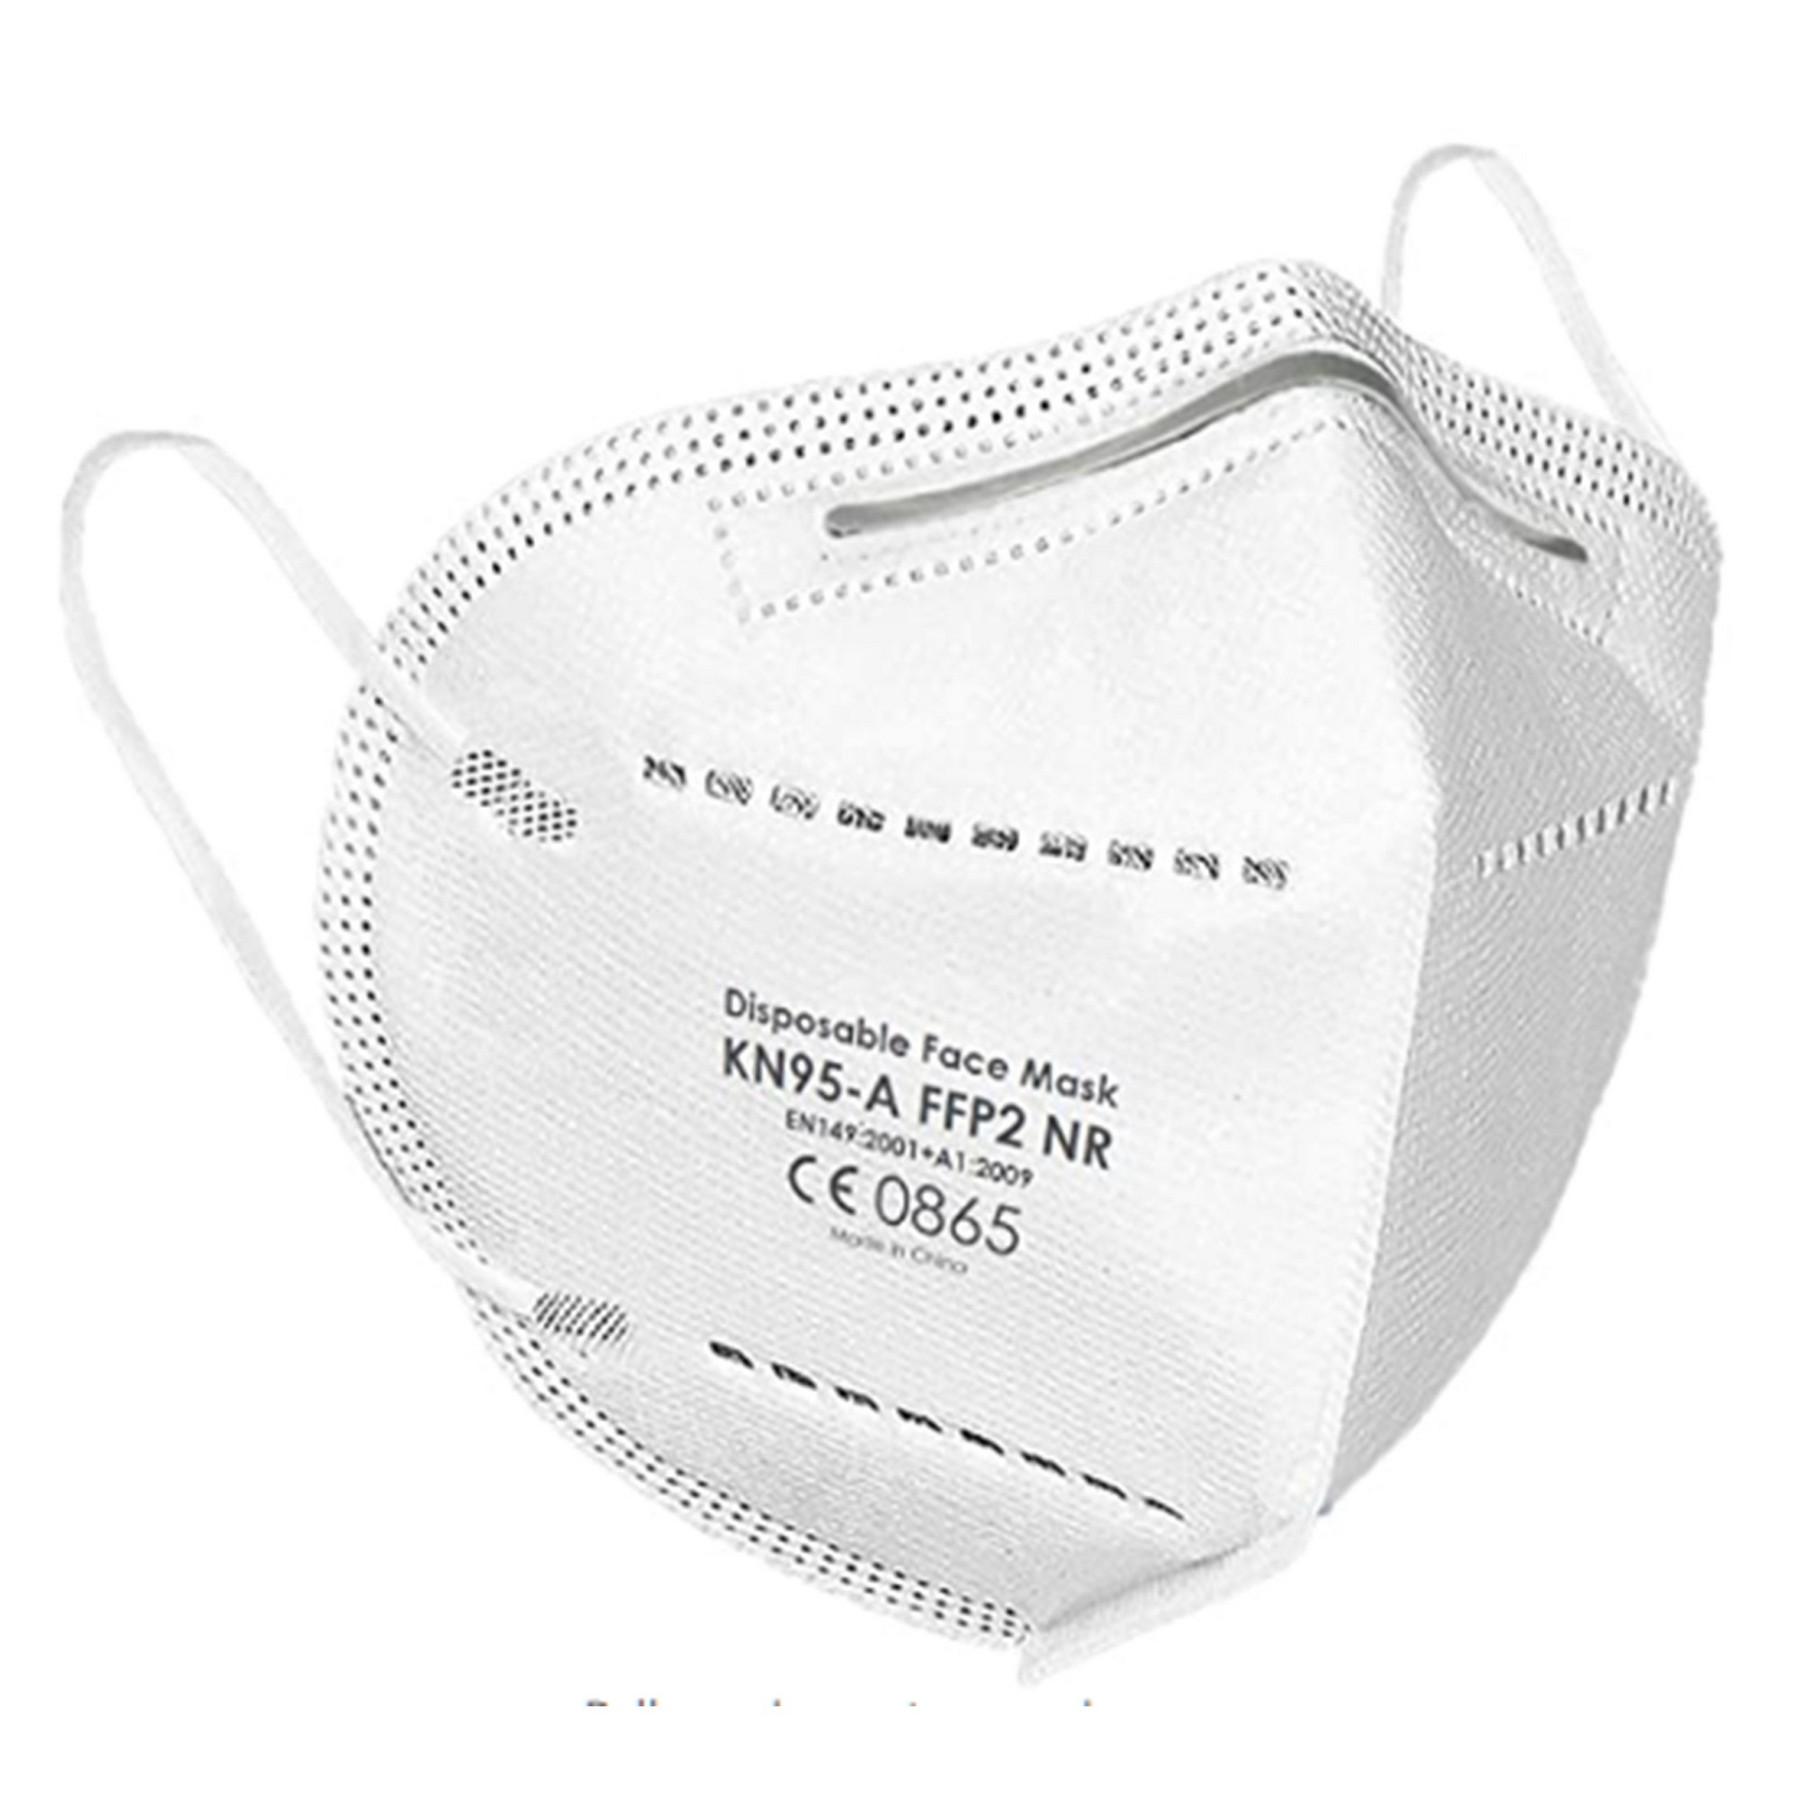 KN95 masks--bulk